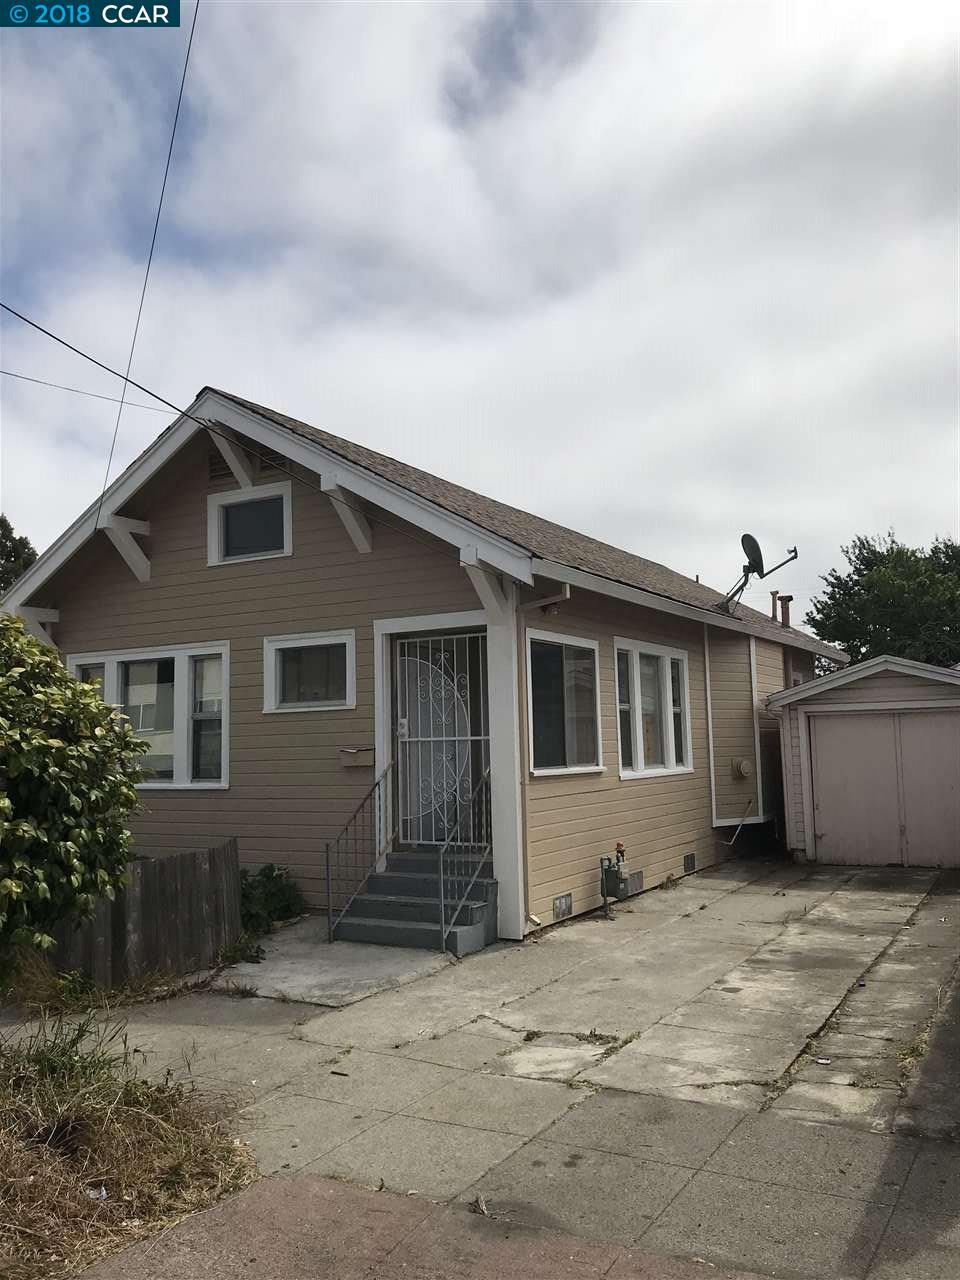 516 21ST ST, RICHMOND, CA 94801